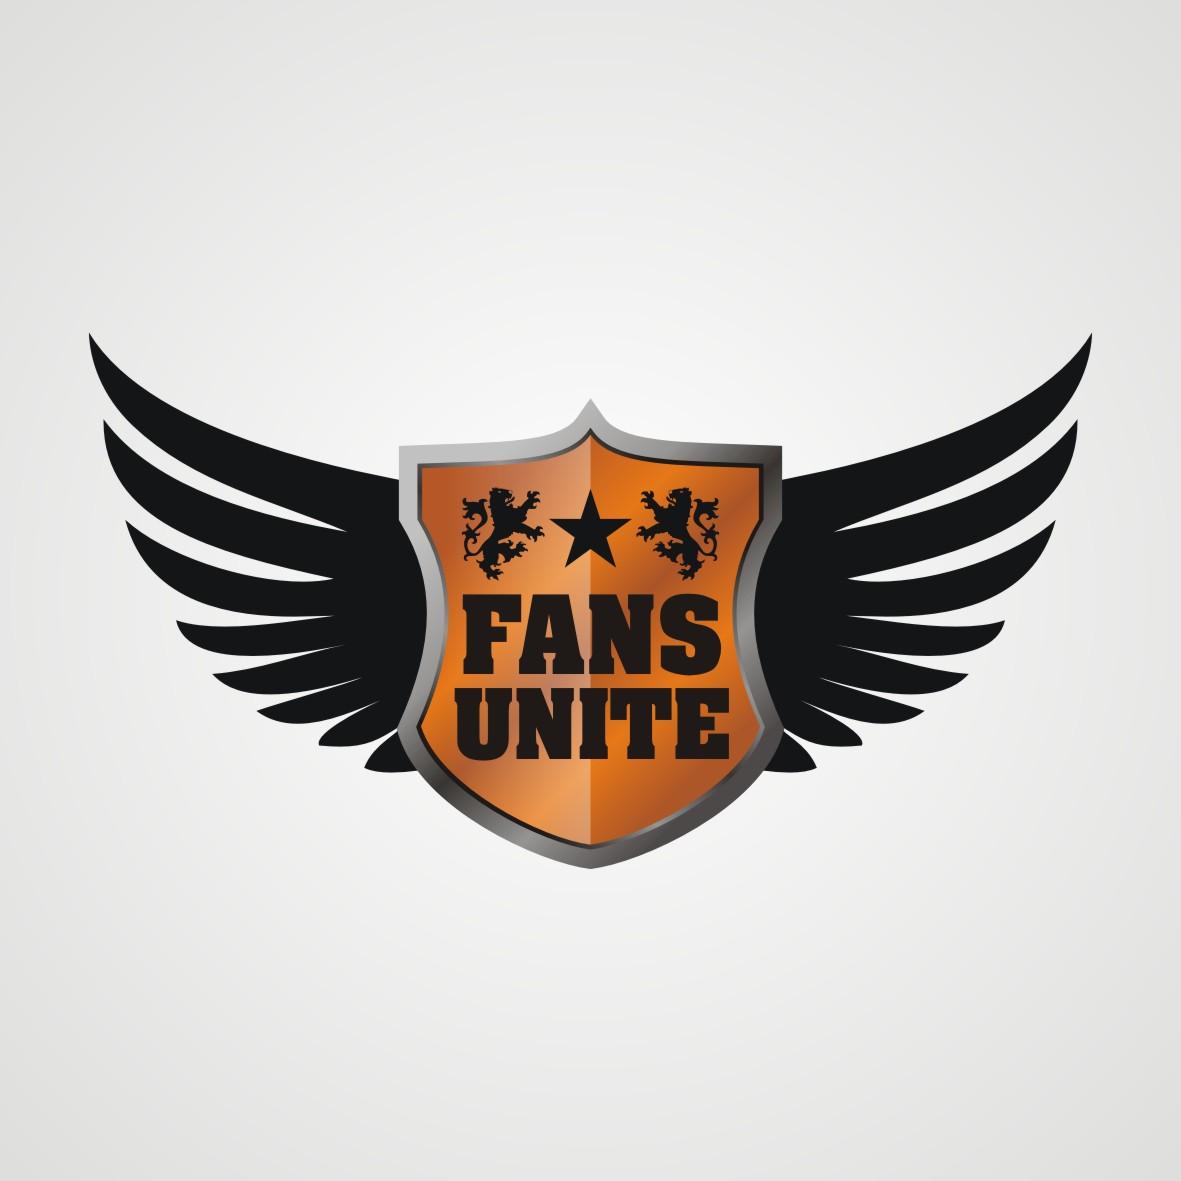 Logo Design by arteo_design - Entry No. 121 in the Logo Design Contest Logo Design Needed for Exciting New Company FansUnite.